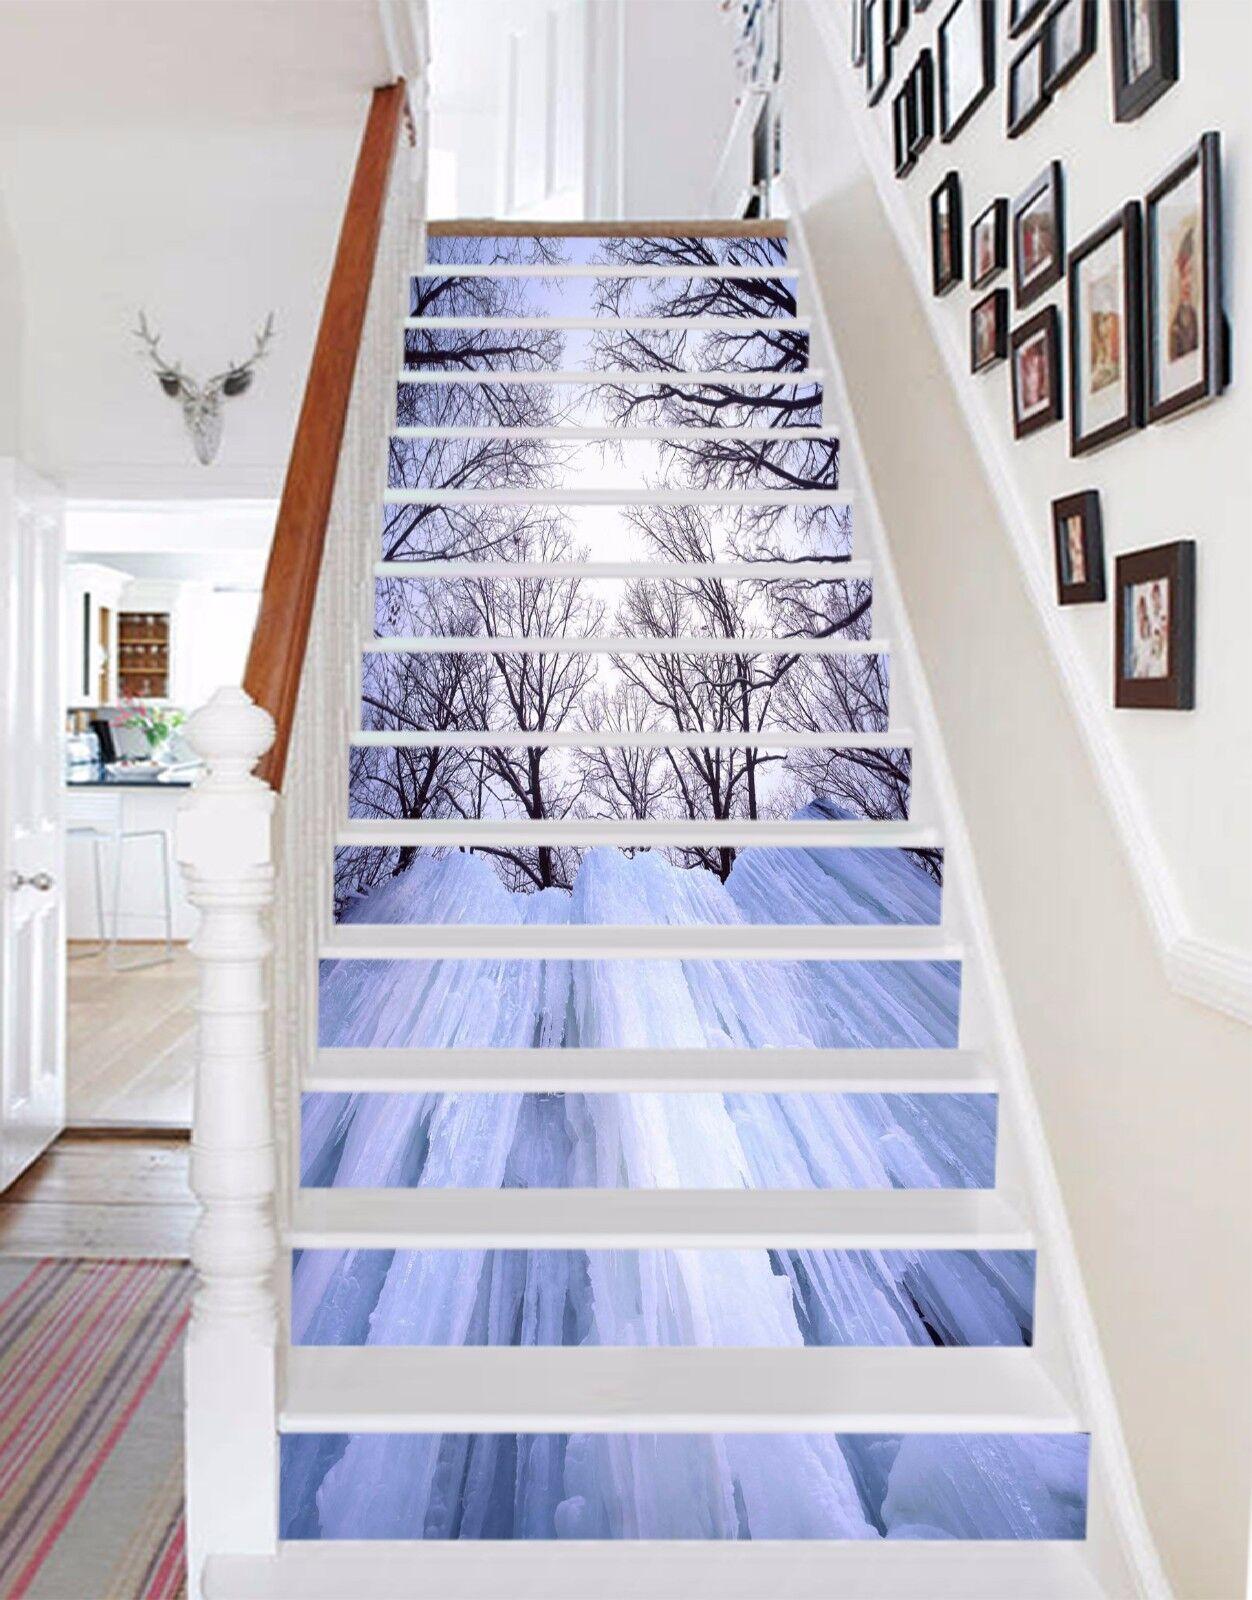 3D Tree snow 337 Stair Risers Decoration Photo Mural Vinyl Decal Wallpaper UK